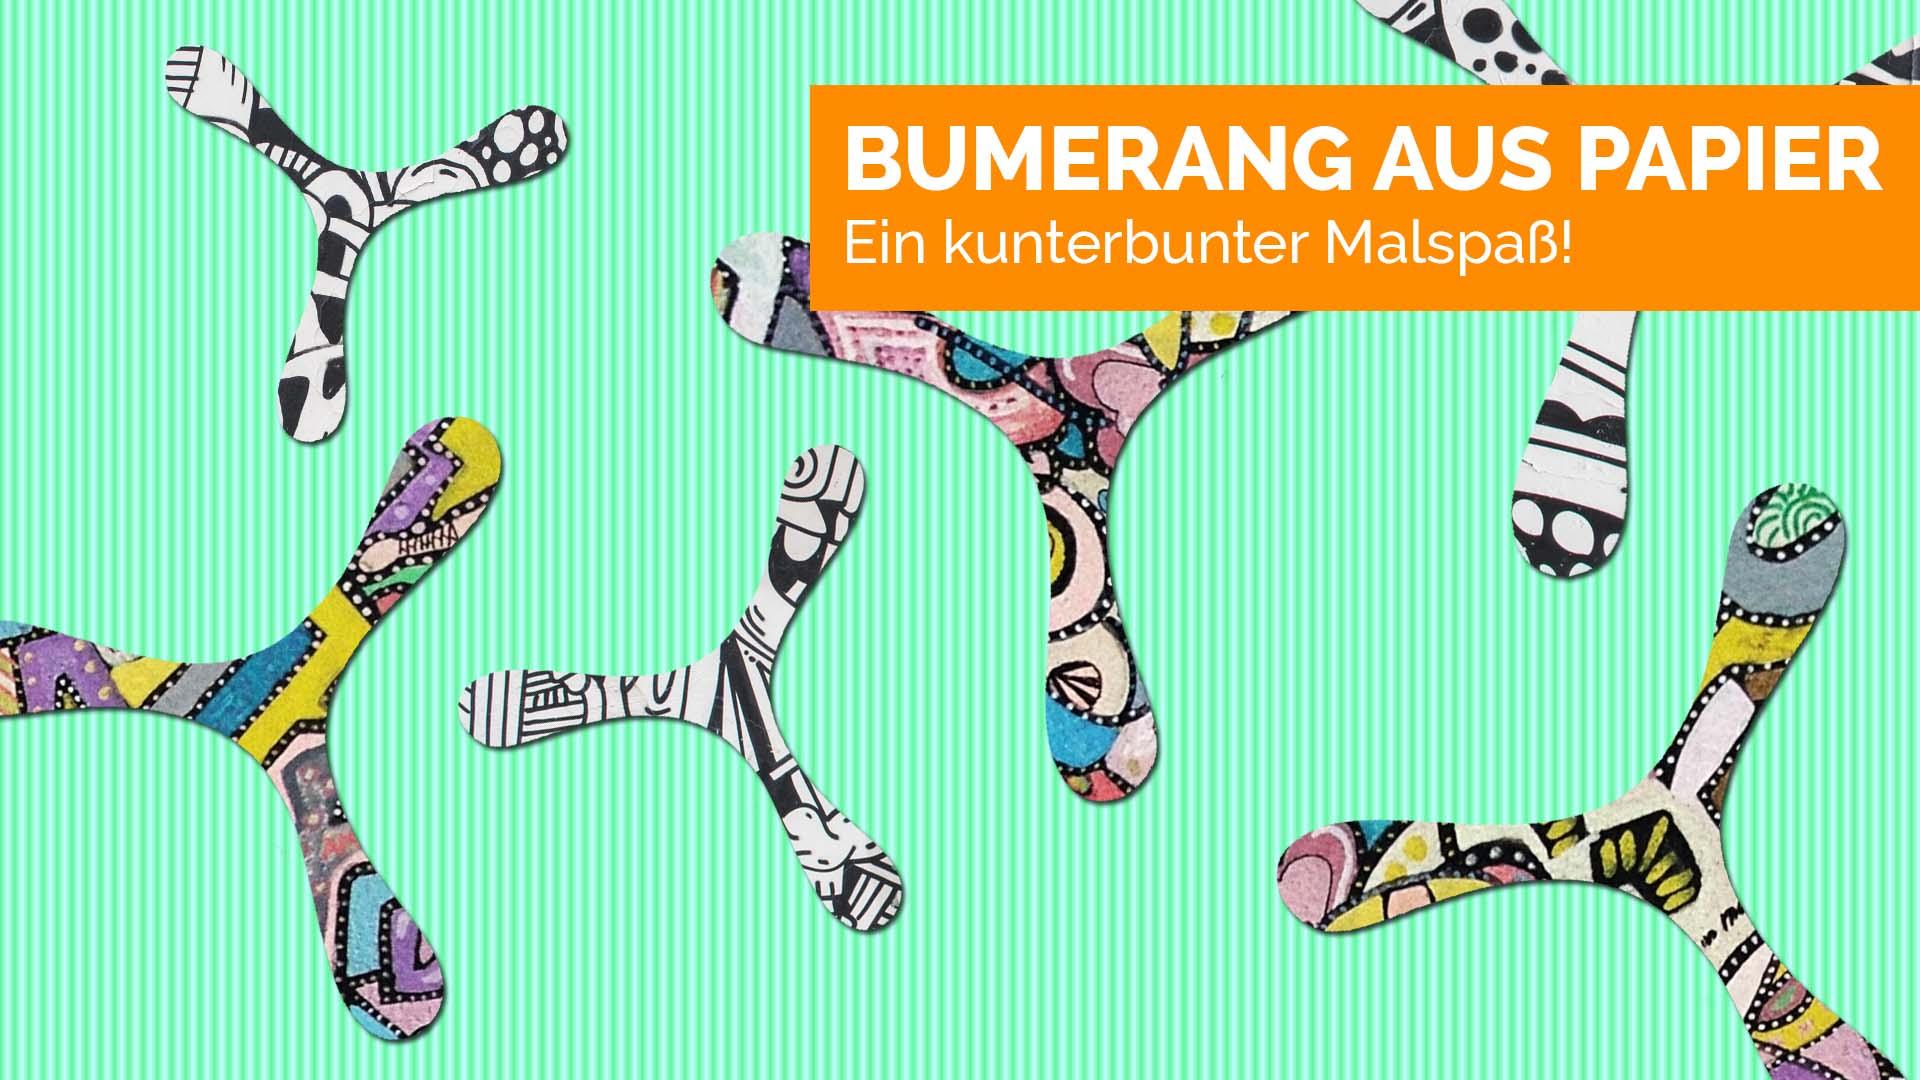 bumerang-aus-papier-titelbild